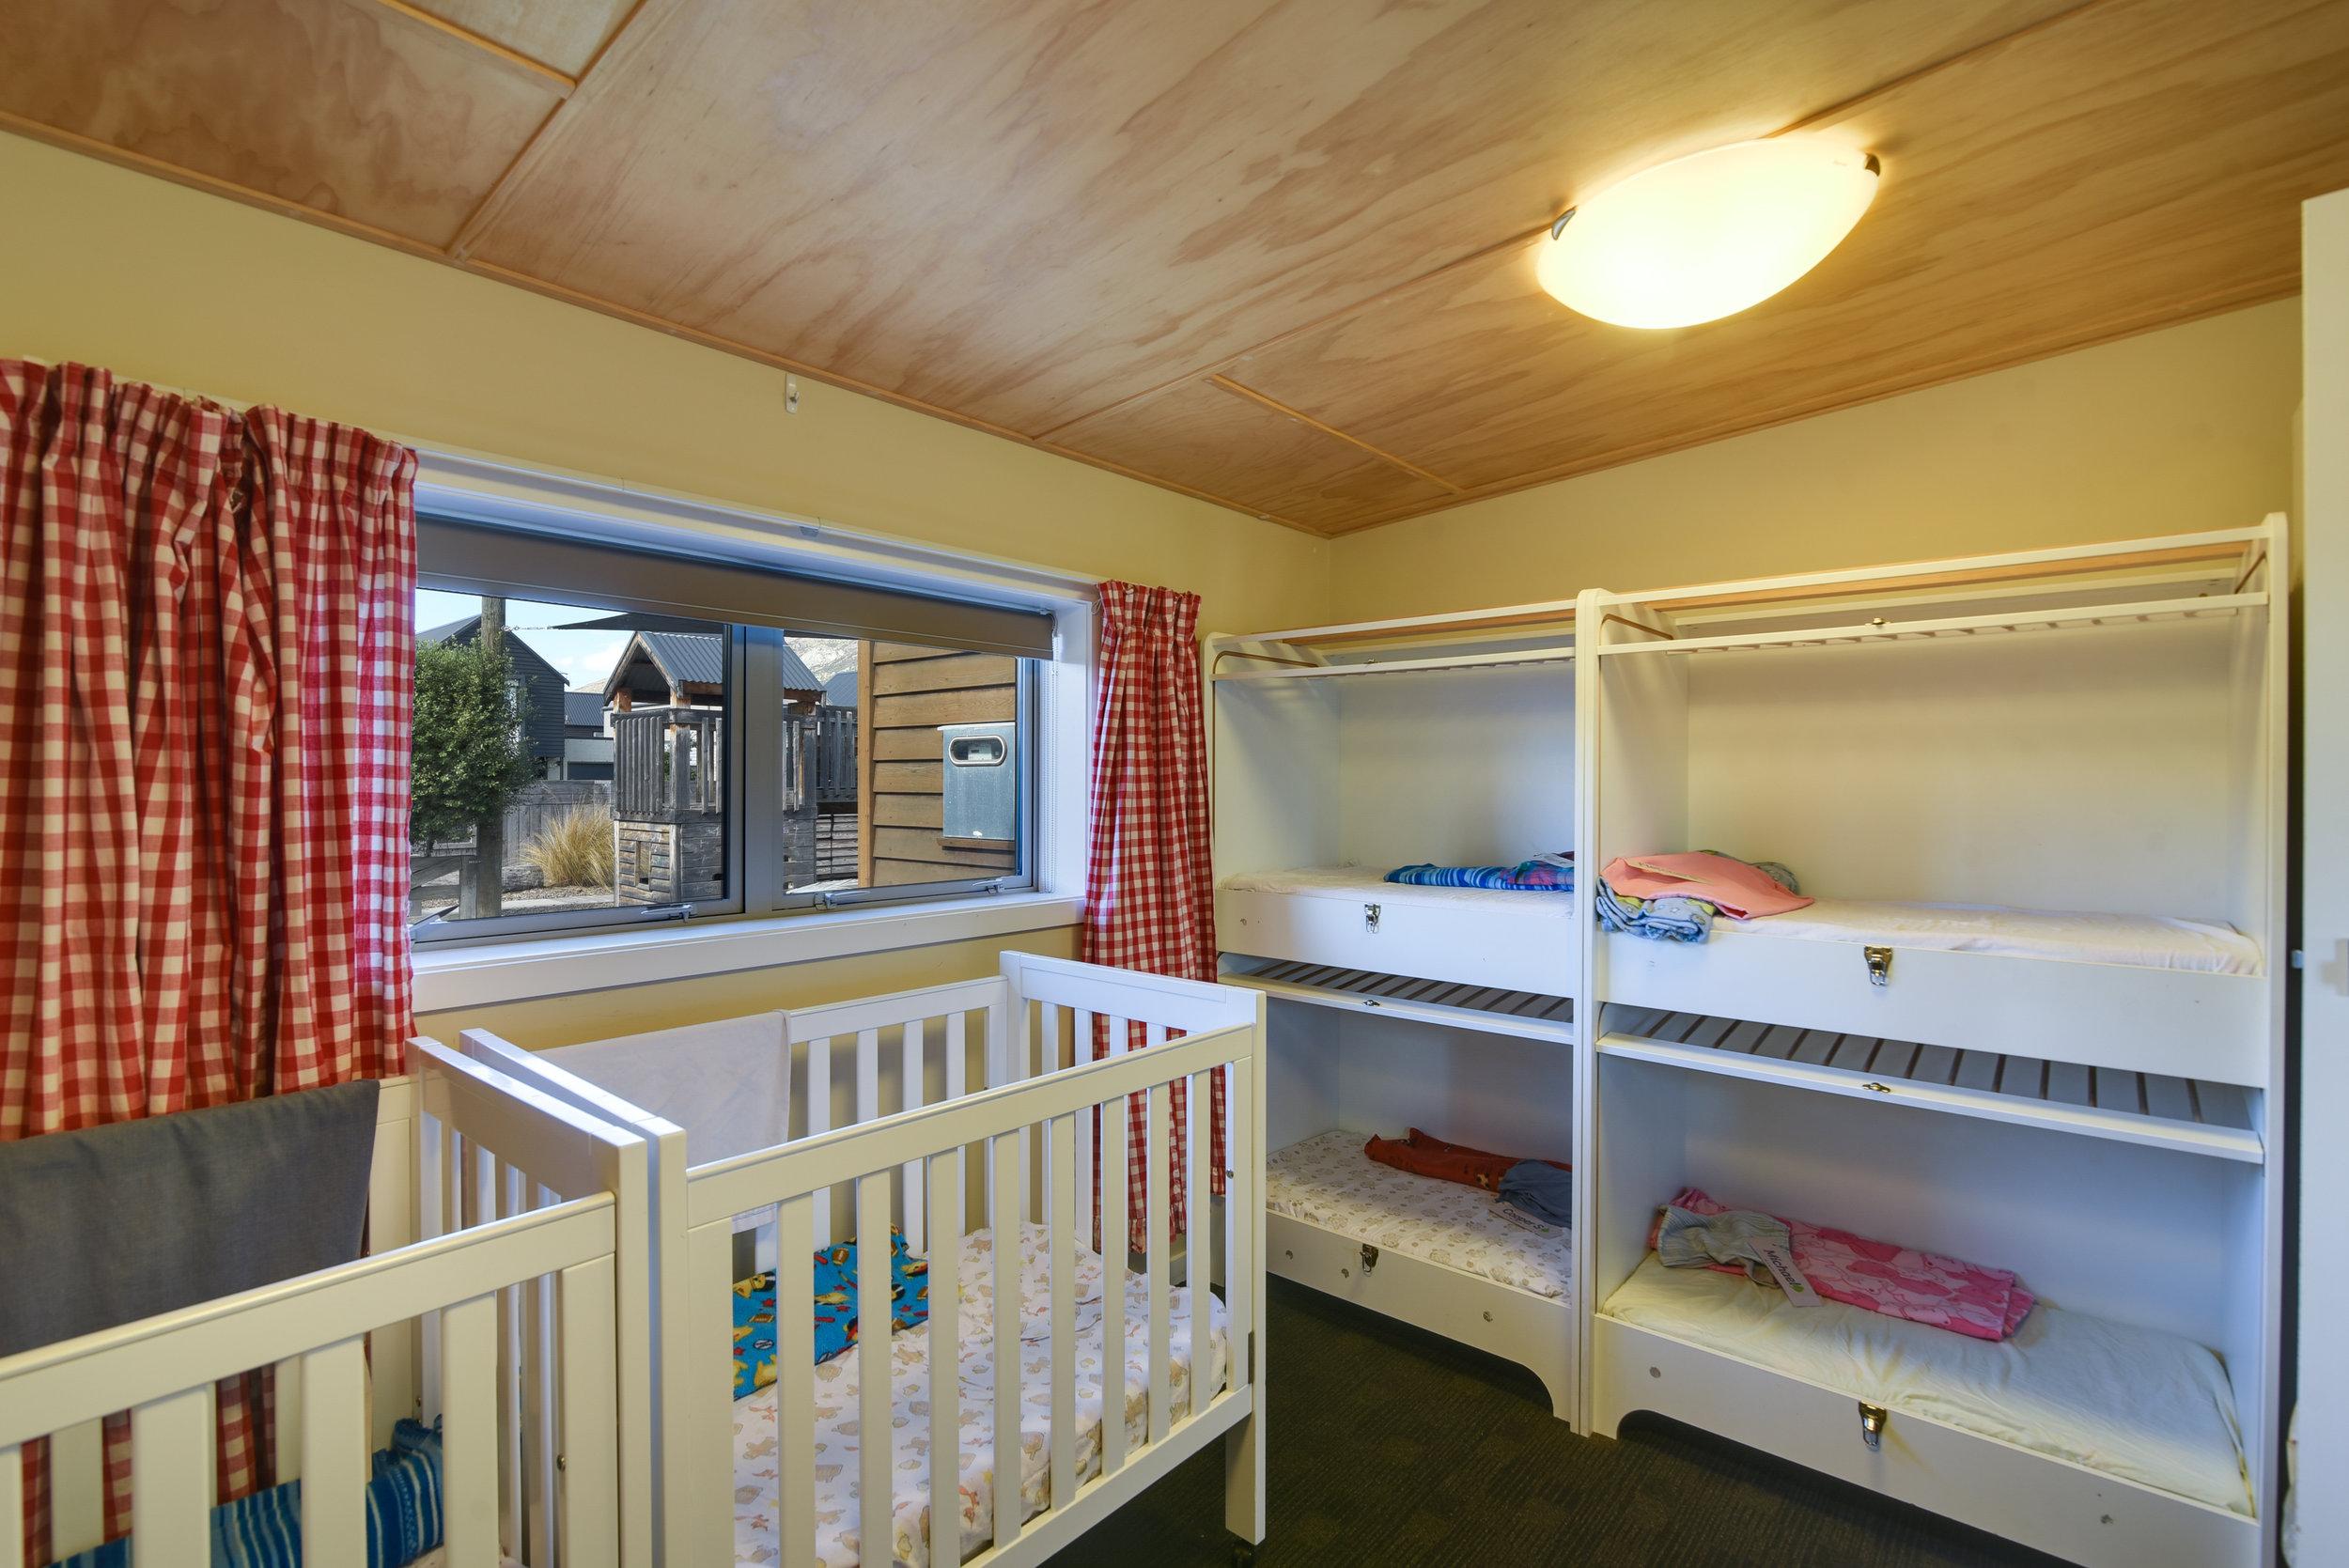 Gems Childcare interiors-18.jpg